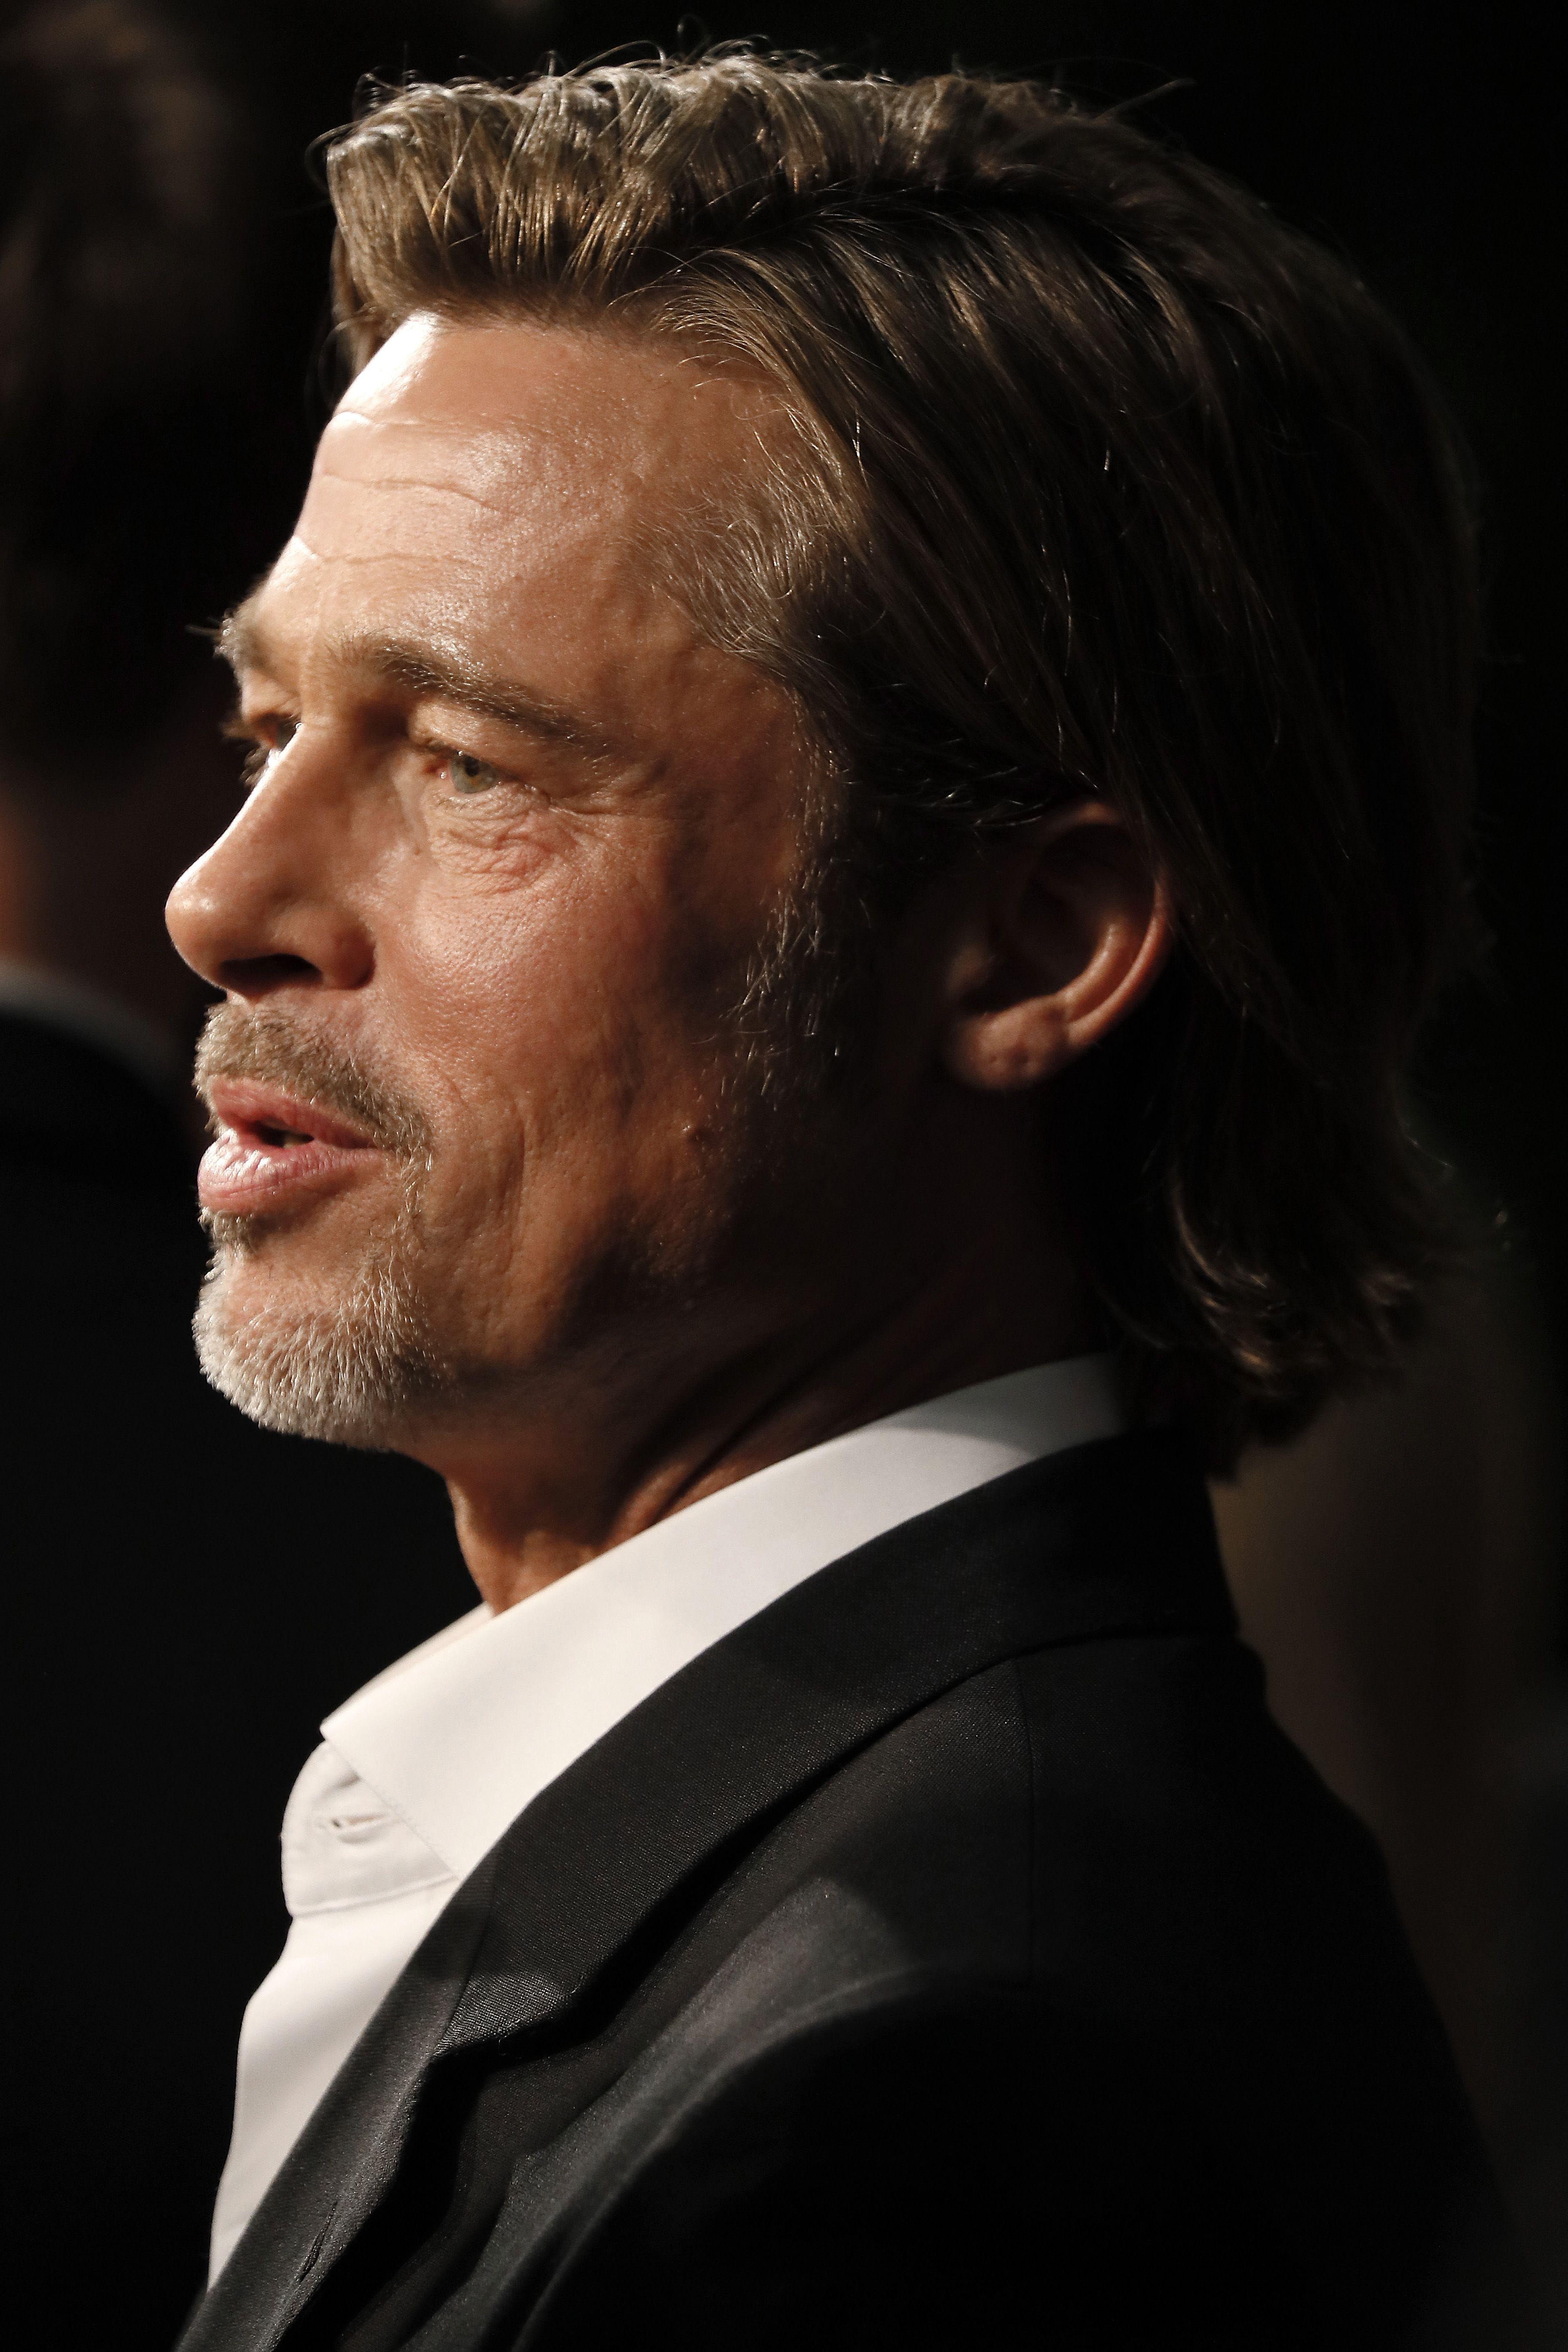 Brad Pitt, Your New Don Corleone